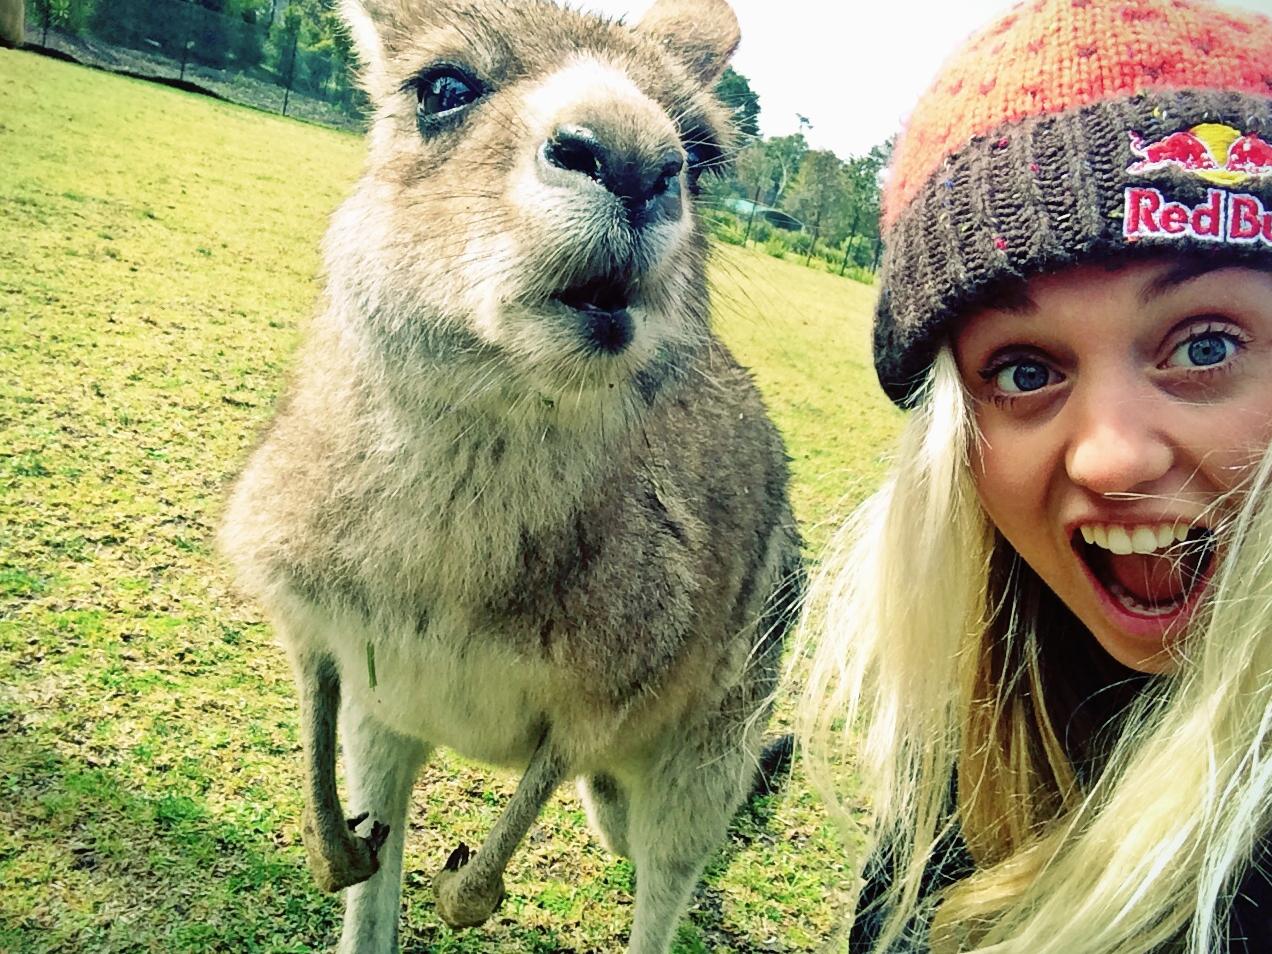 My Australian mate.